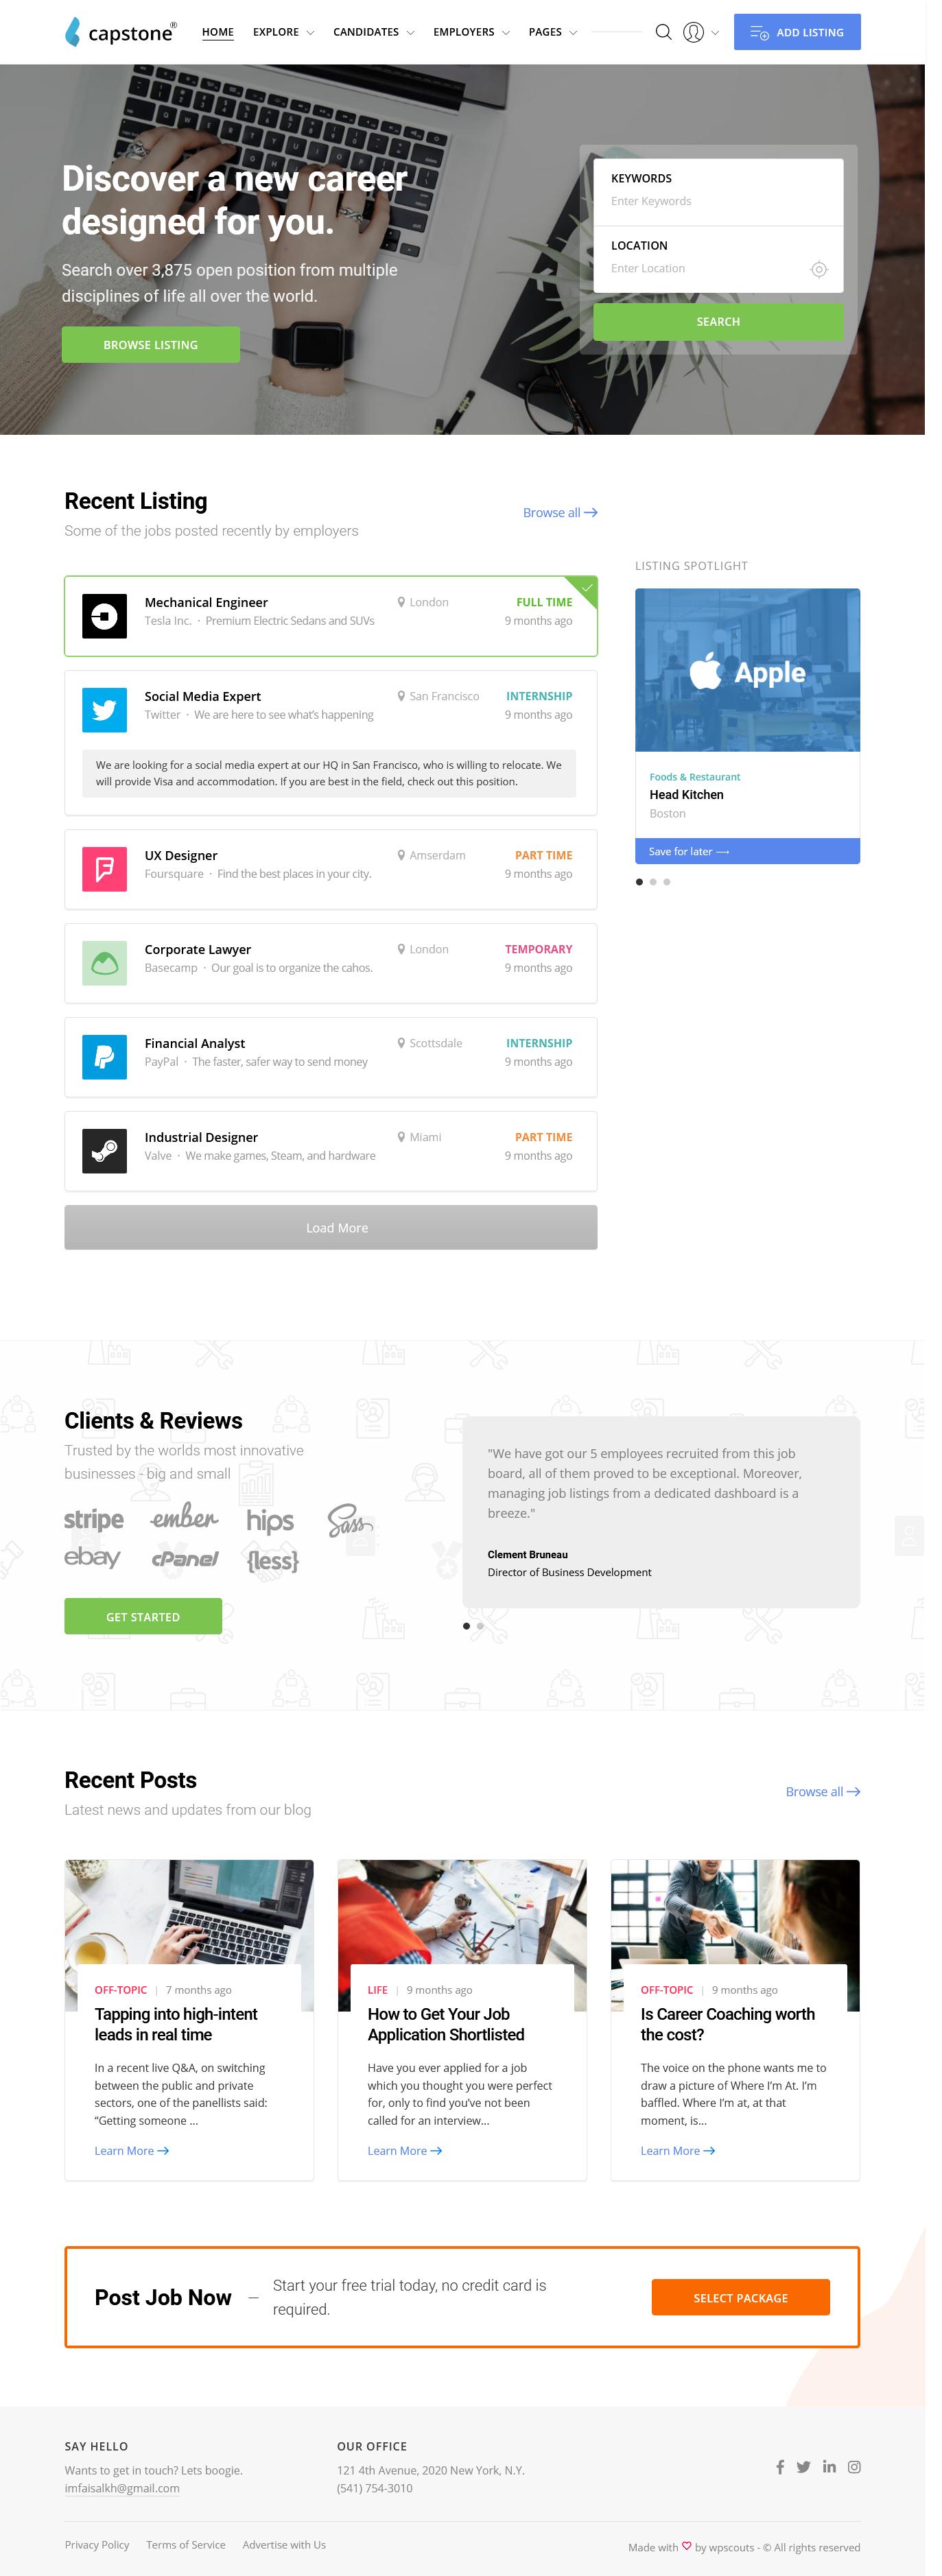 capstone best premium job board wordpress theme - 10+ Best Premium Job Board WordPress Themes